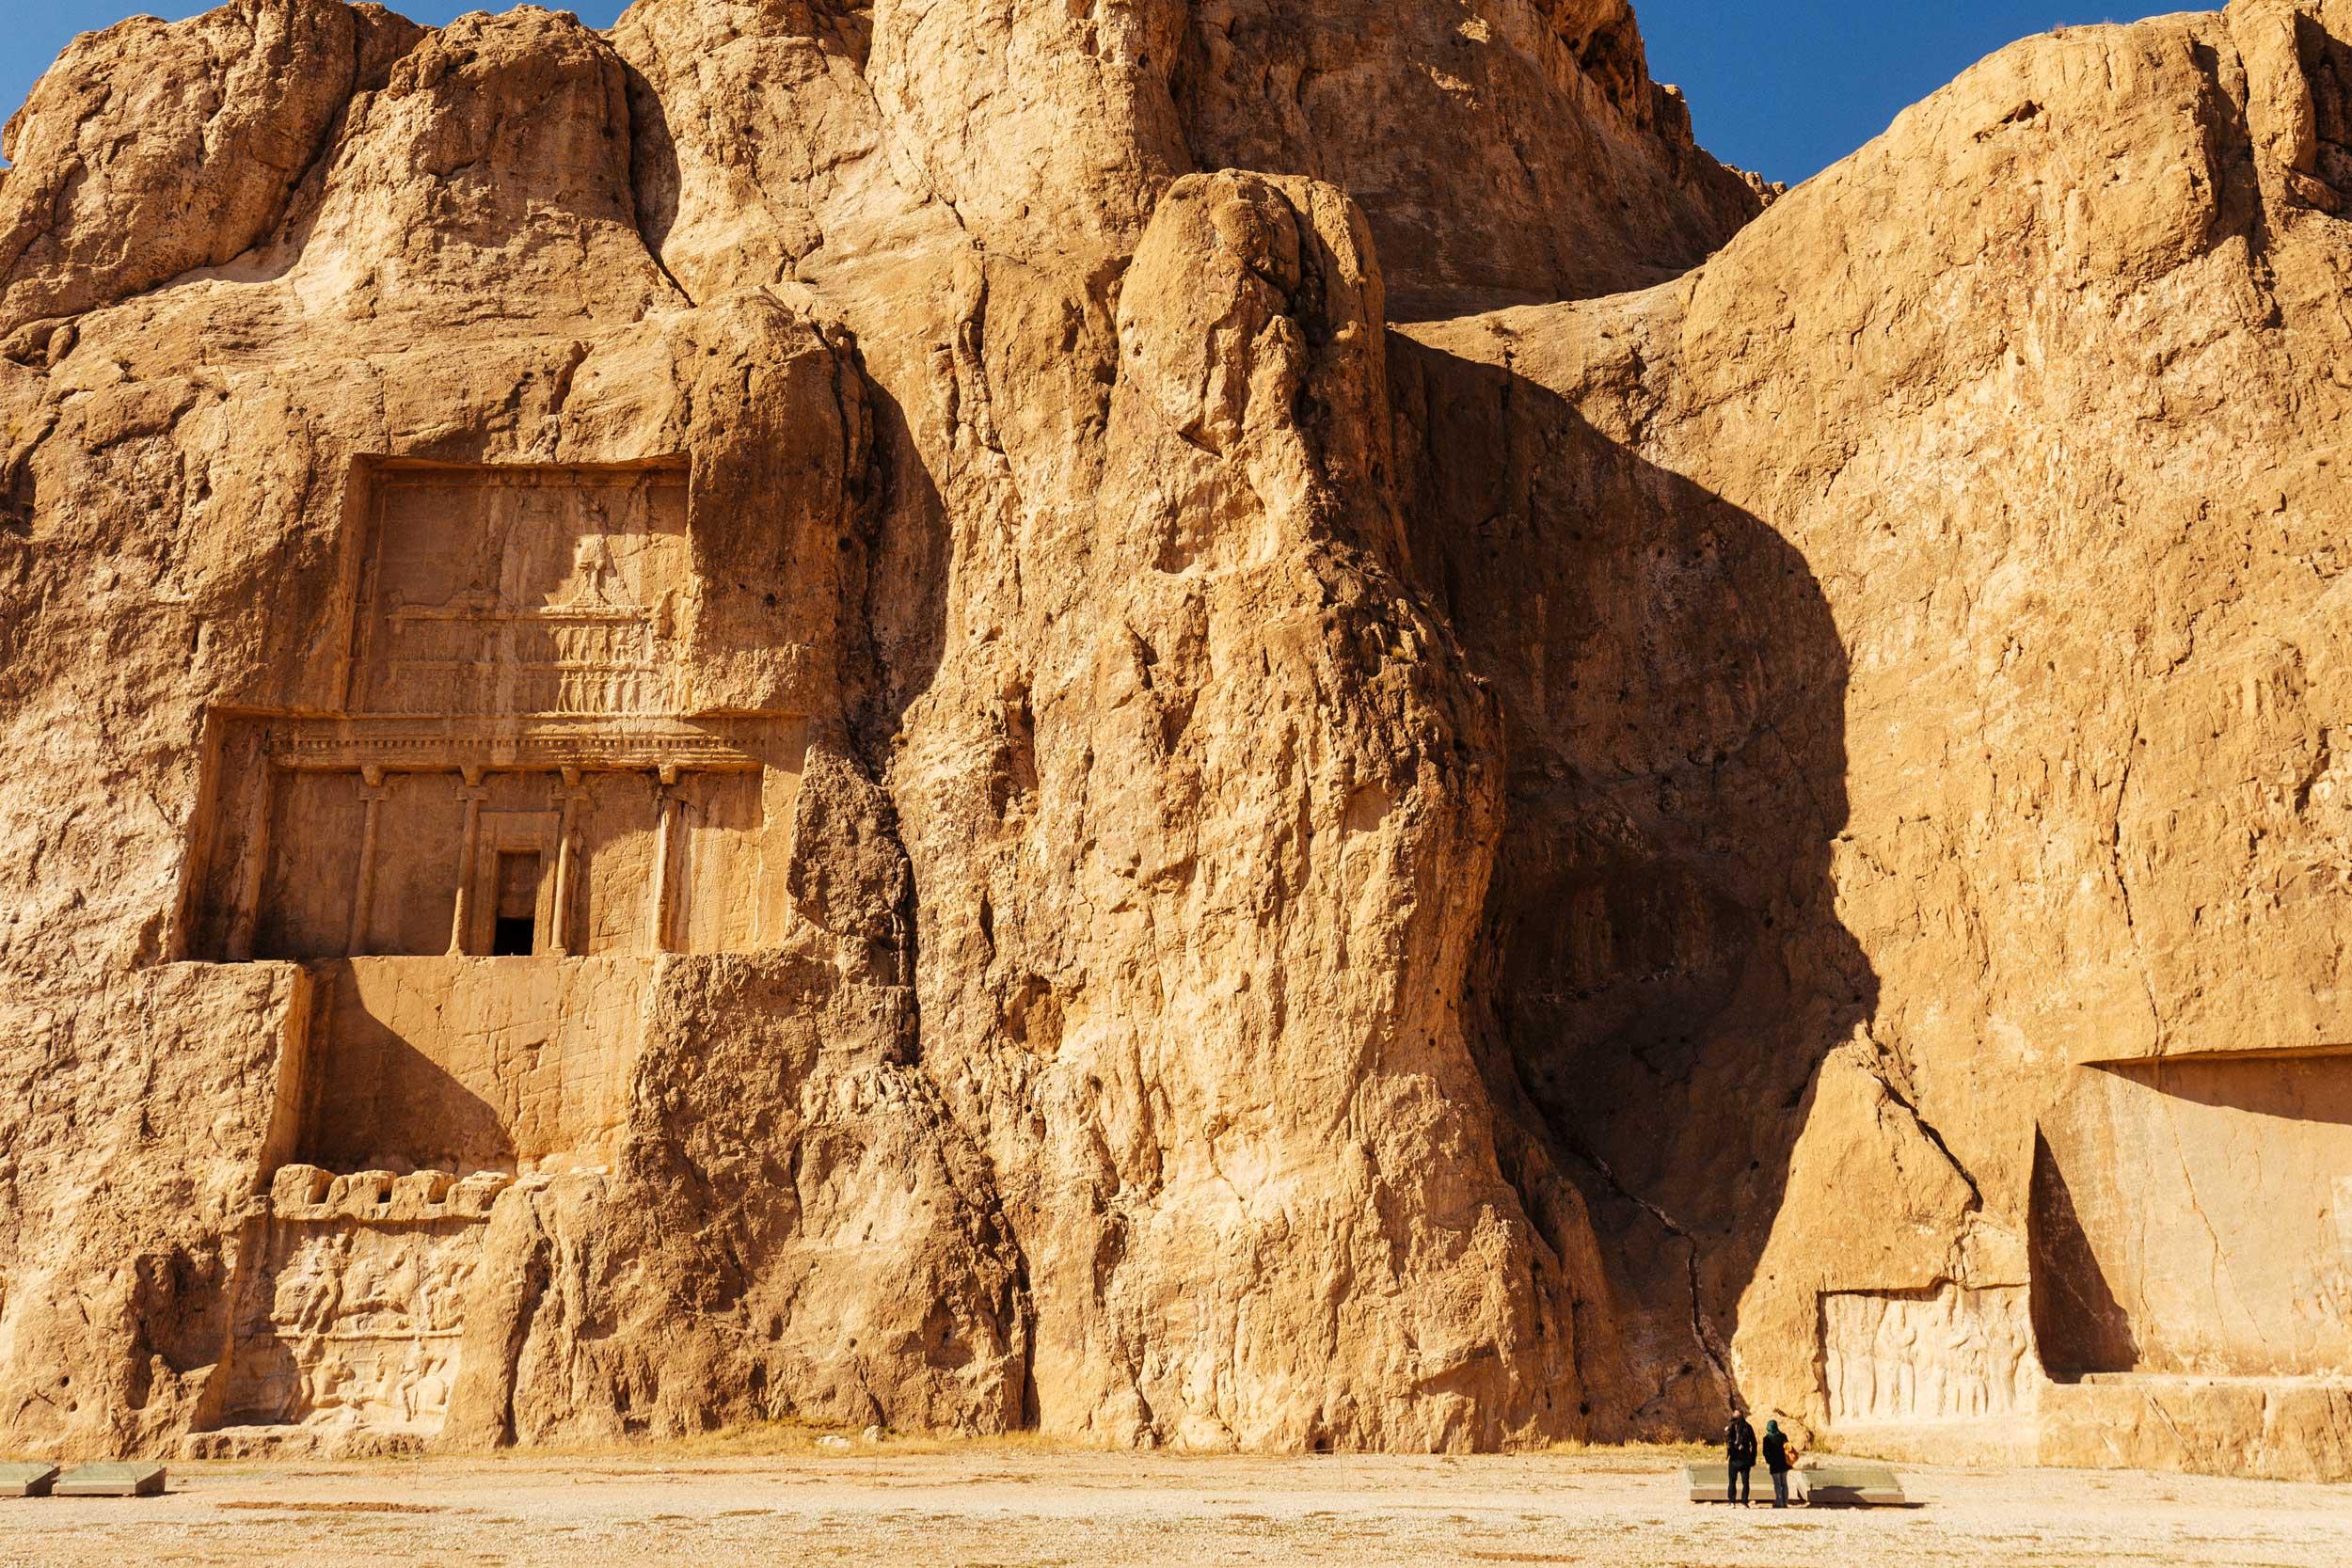 Building carved into a rock hillside in Iran near Shiraz